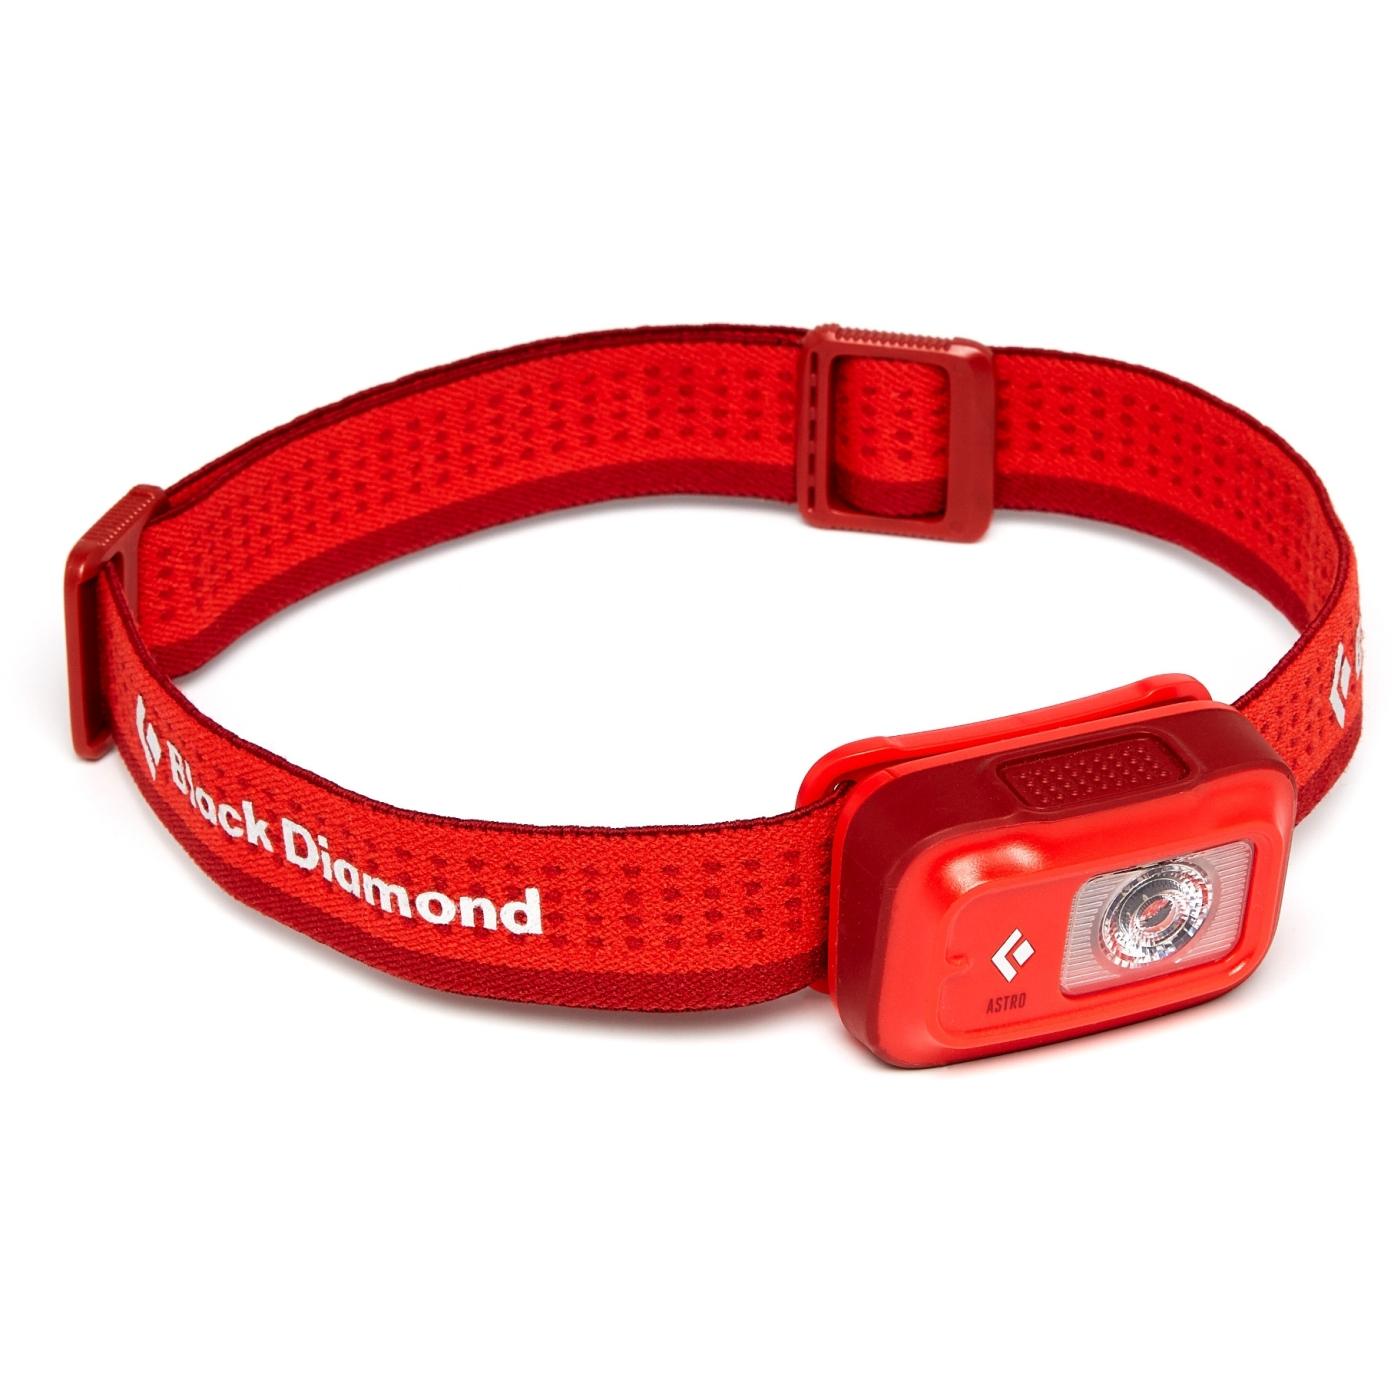 Black Diamond Astro 250 Headlamp - Octane